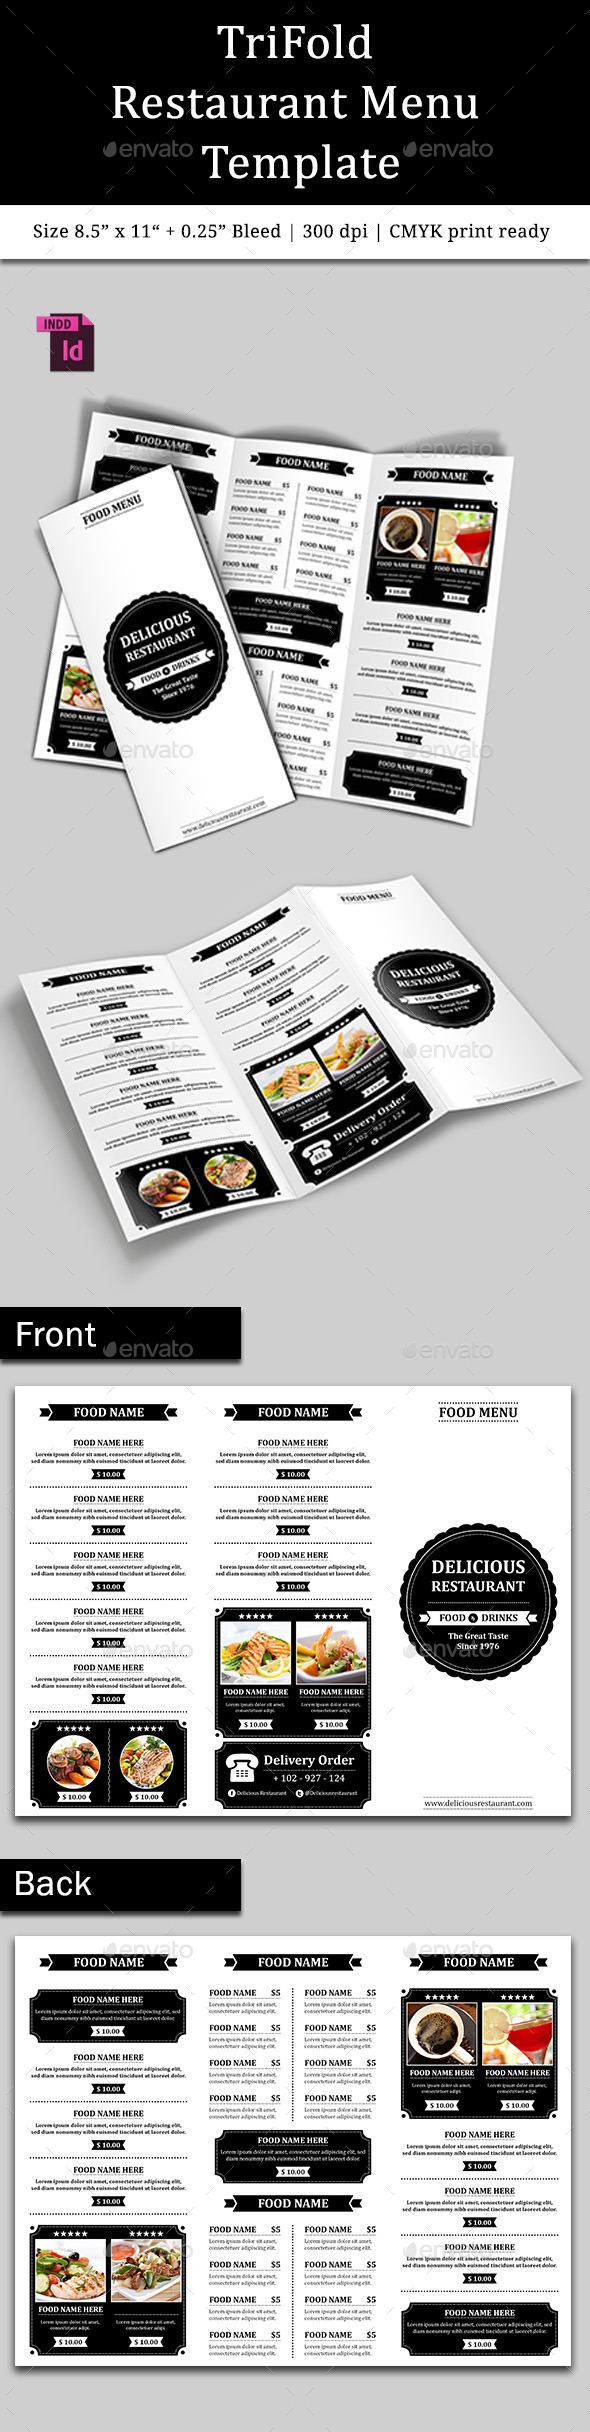 GraphicRiver TriFold Restaurant Menu Template Vol 6 10401951